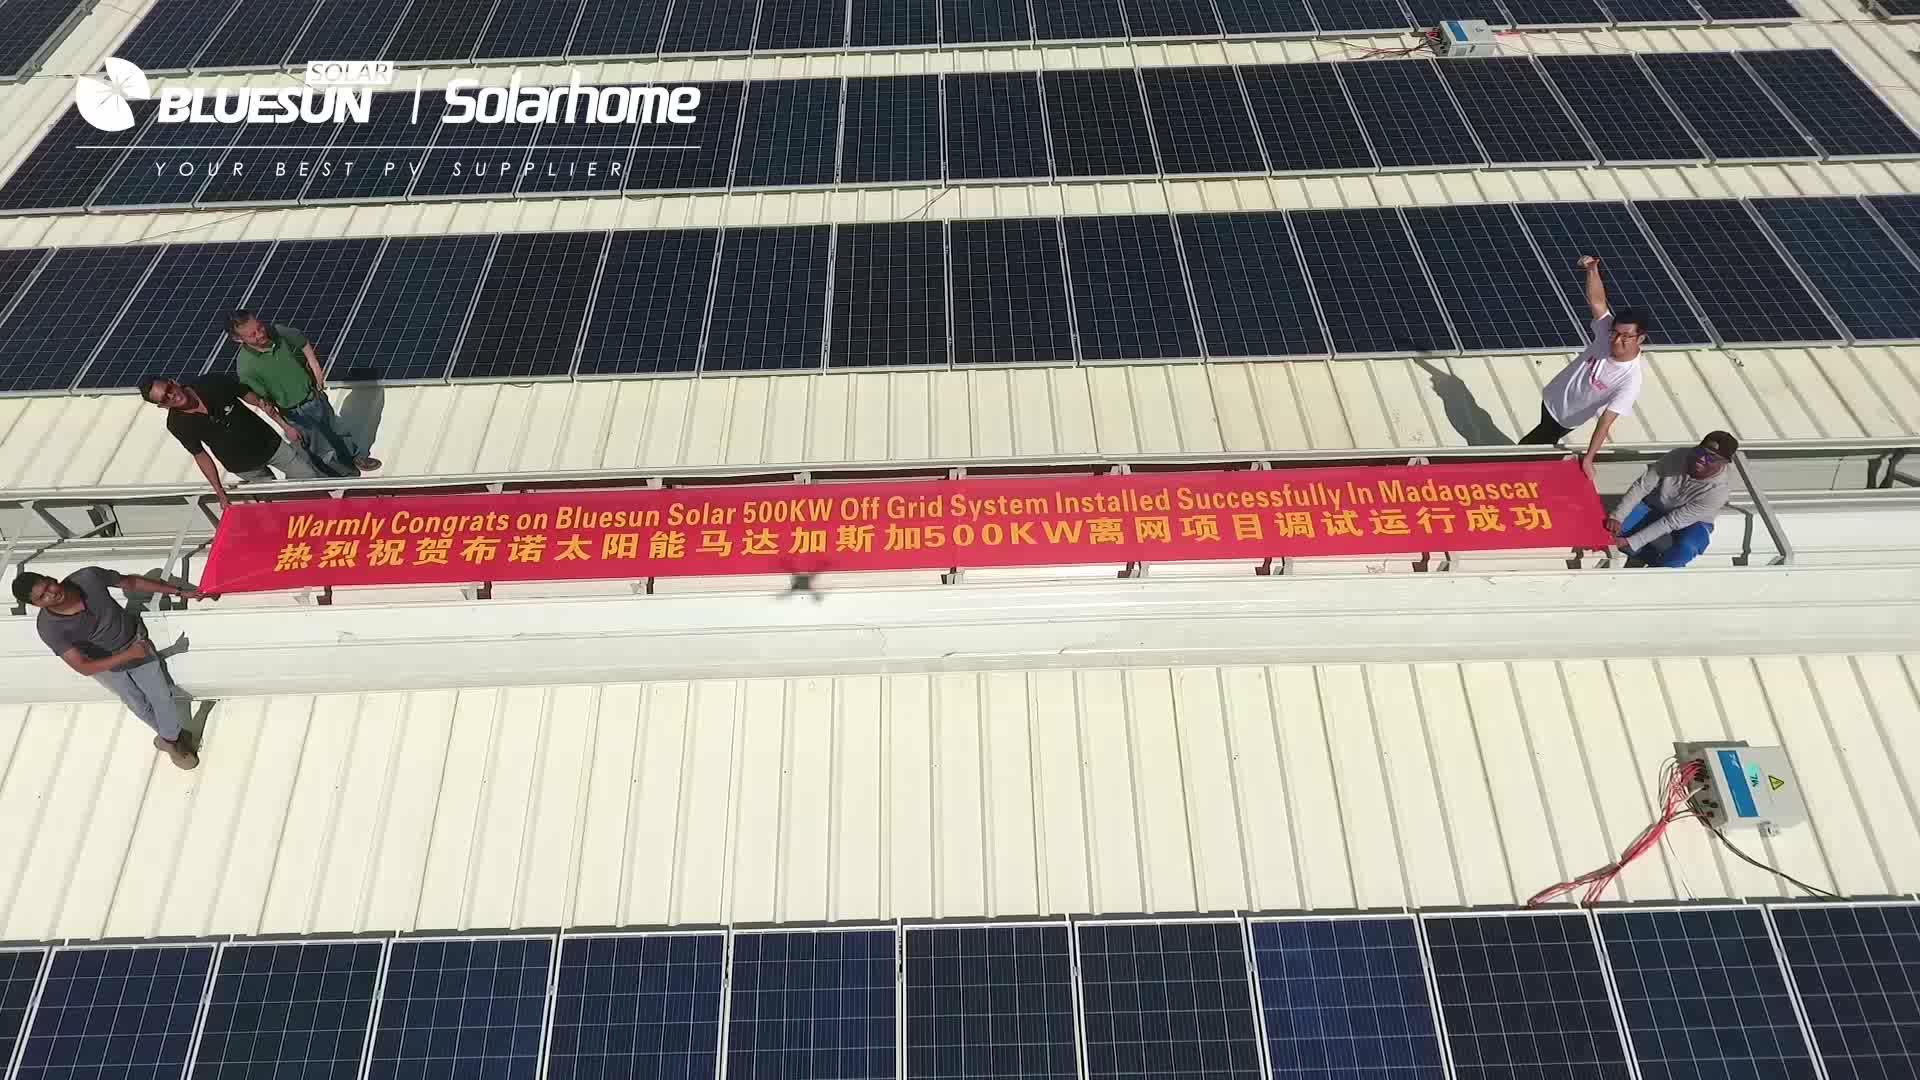 Half cell trina solar panel 320w 330w monocrystalline solar cell 340w 350w 360w 370w 380w wholesale price solar panels